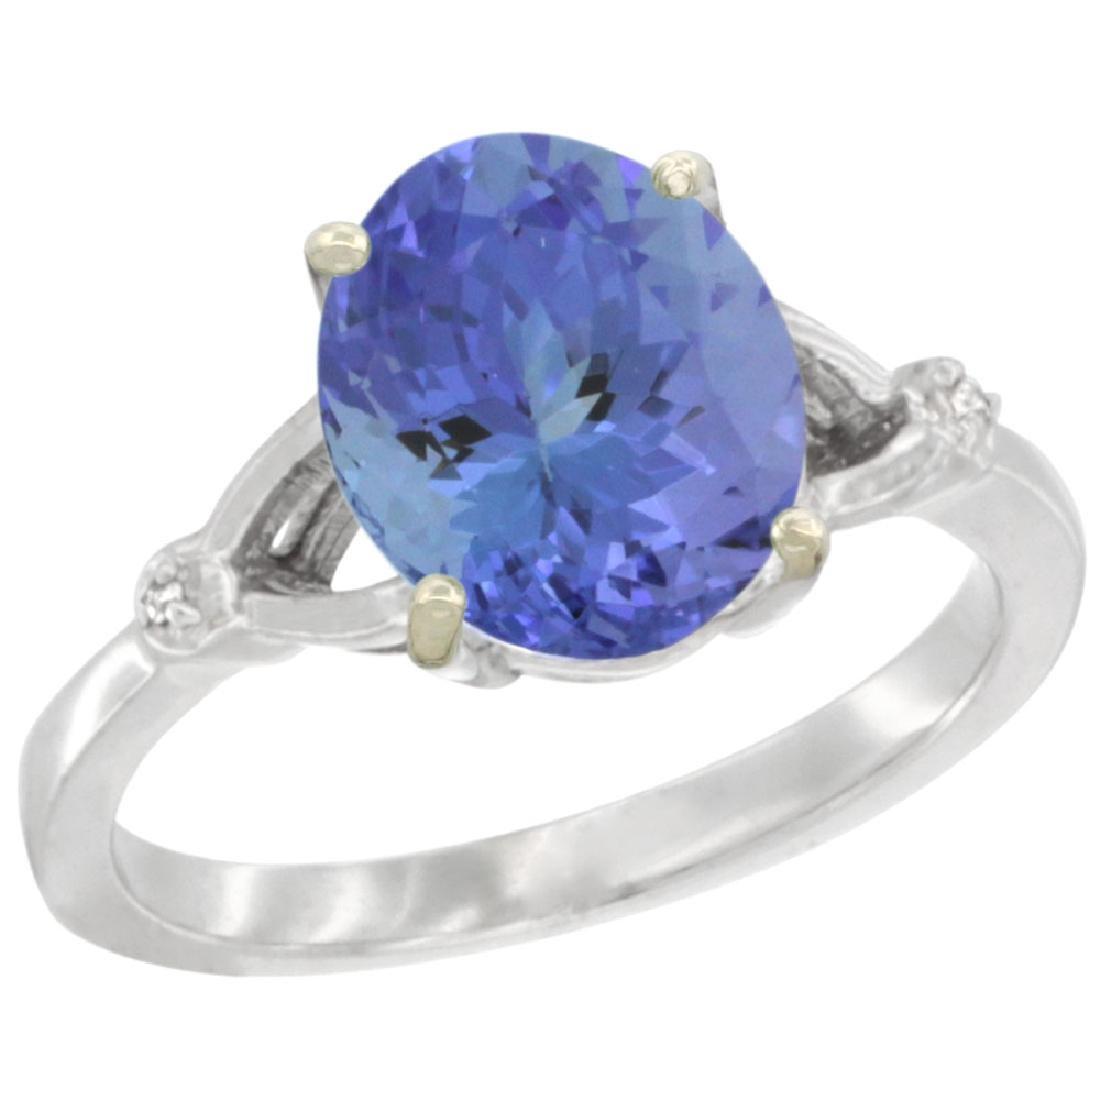 Natural 2.4 ctw Tanzanite & Diamond Engagement Ring 14K